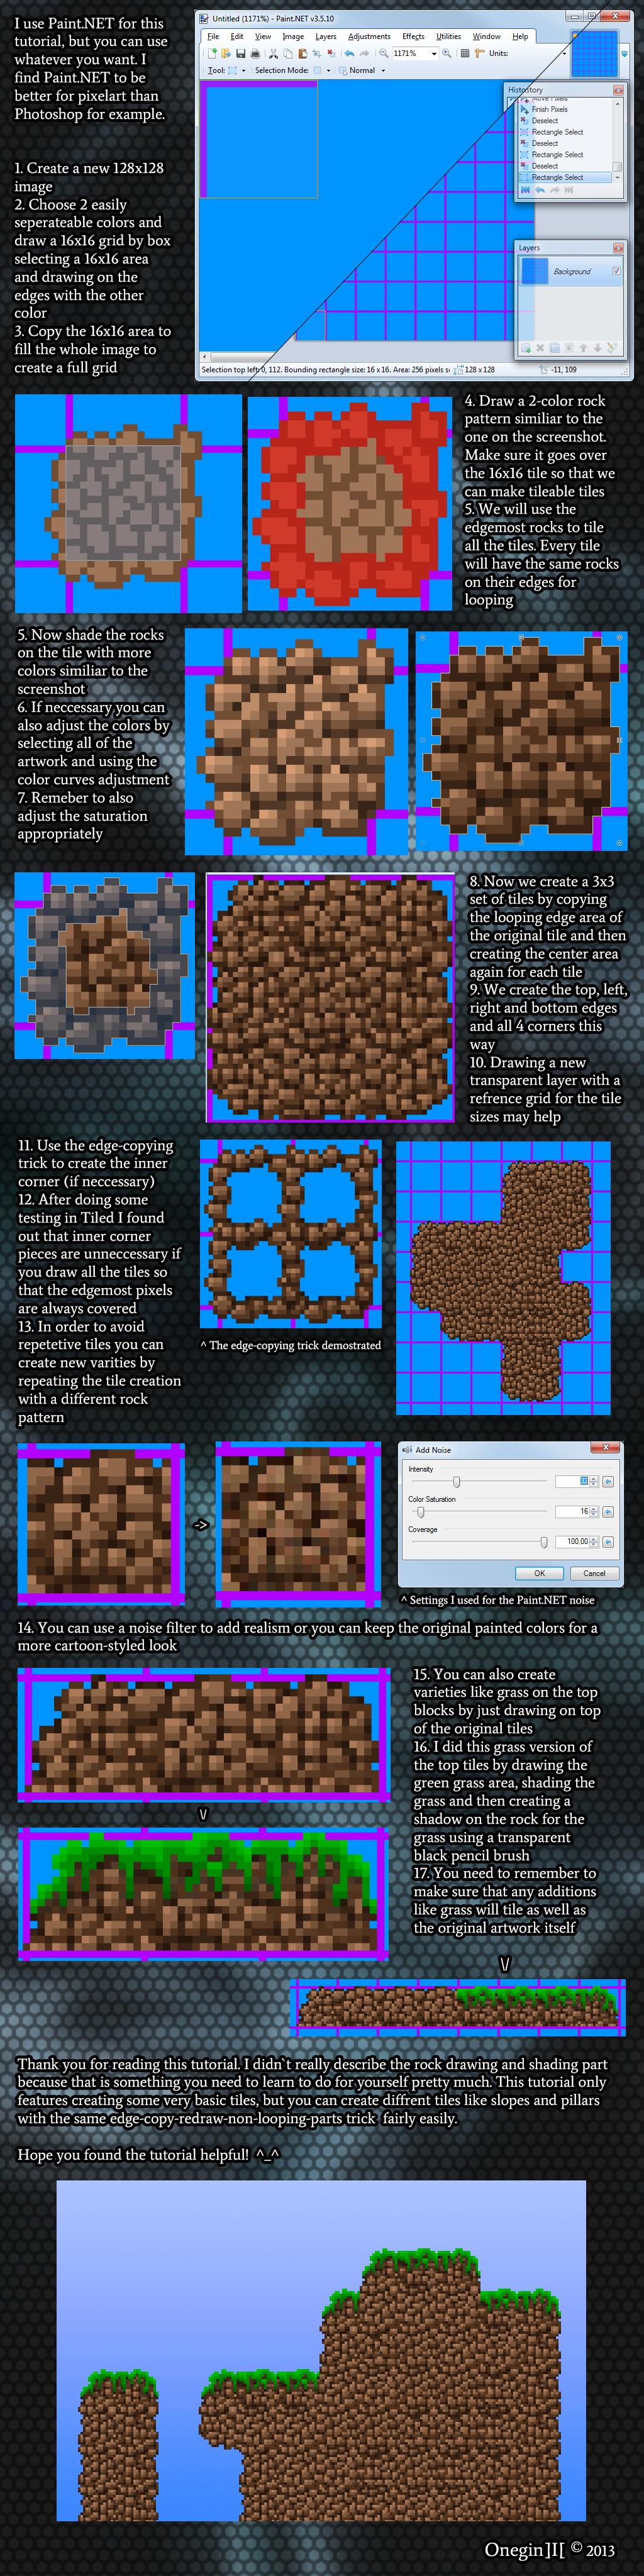 16x16 Pixelart rock wall tileset tutorial by OneginIII